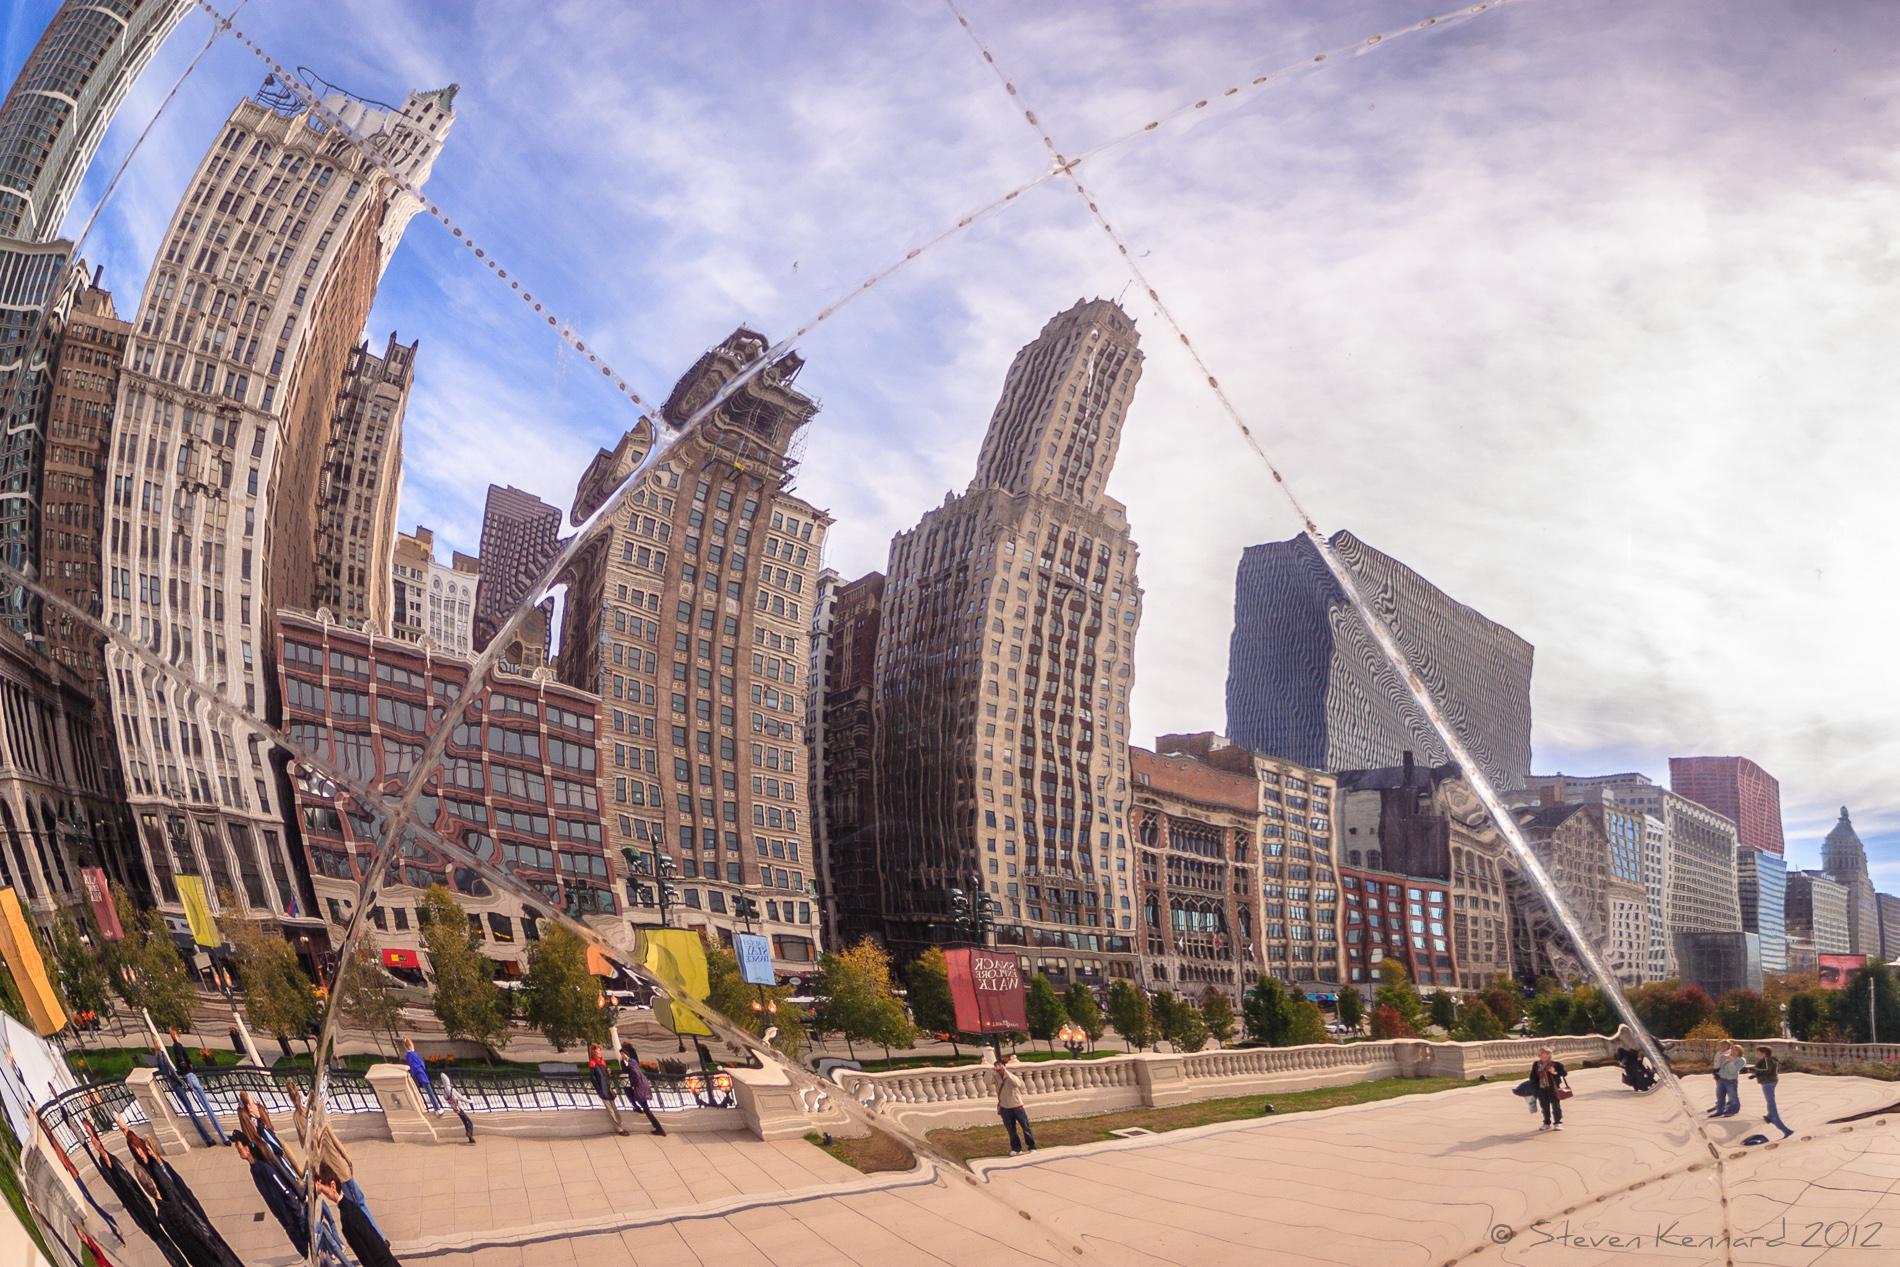 Chicago seen through the bean - Steven Kennard 2012